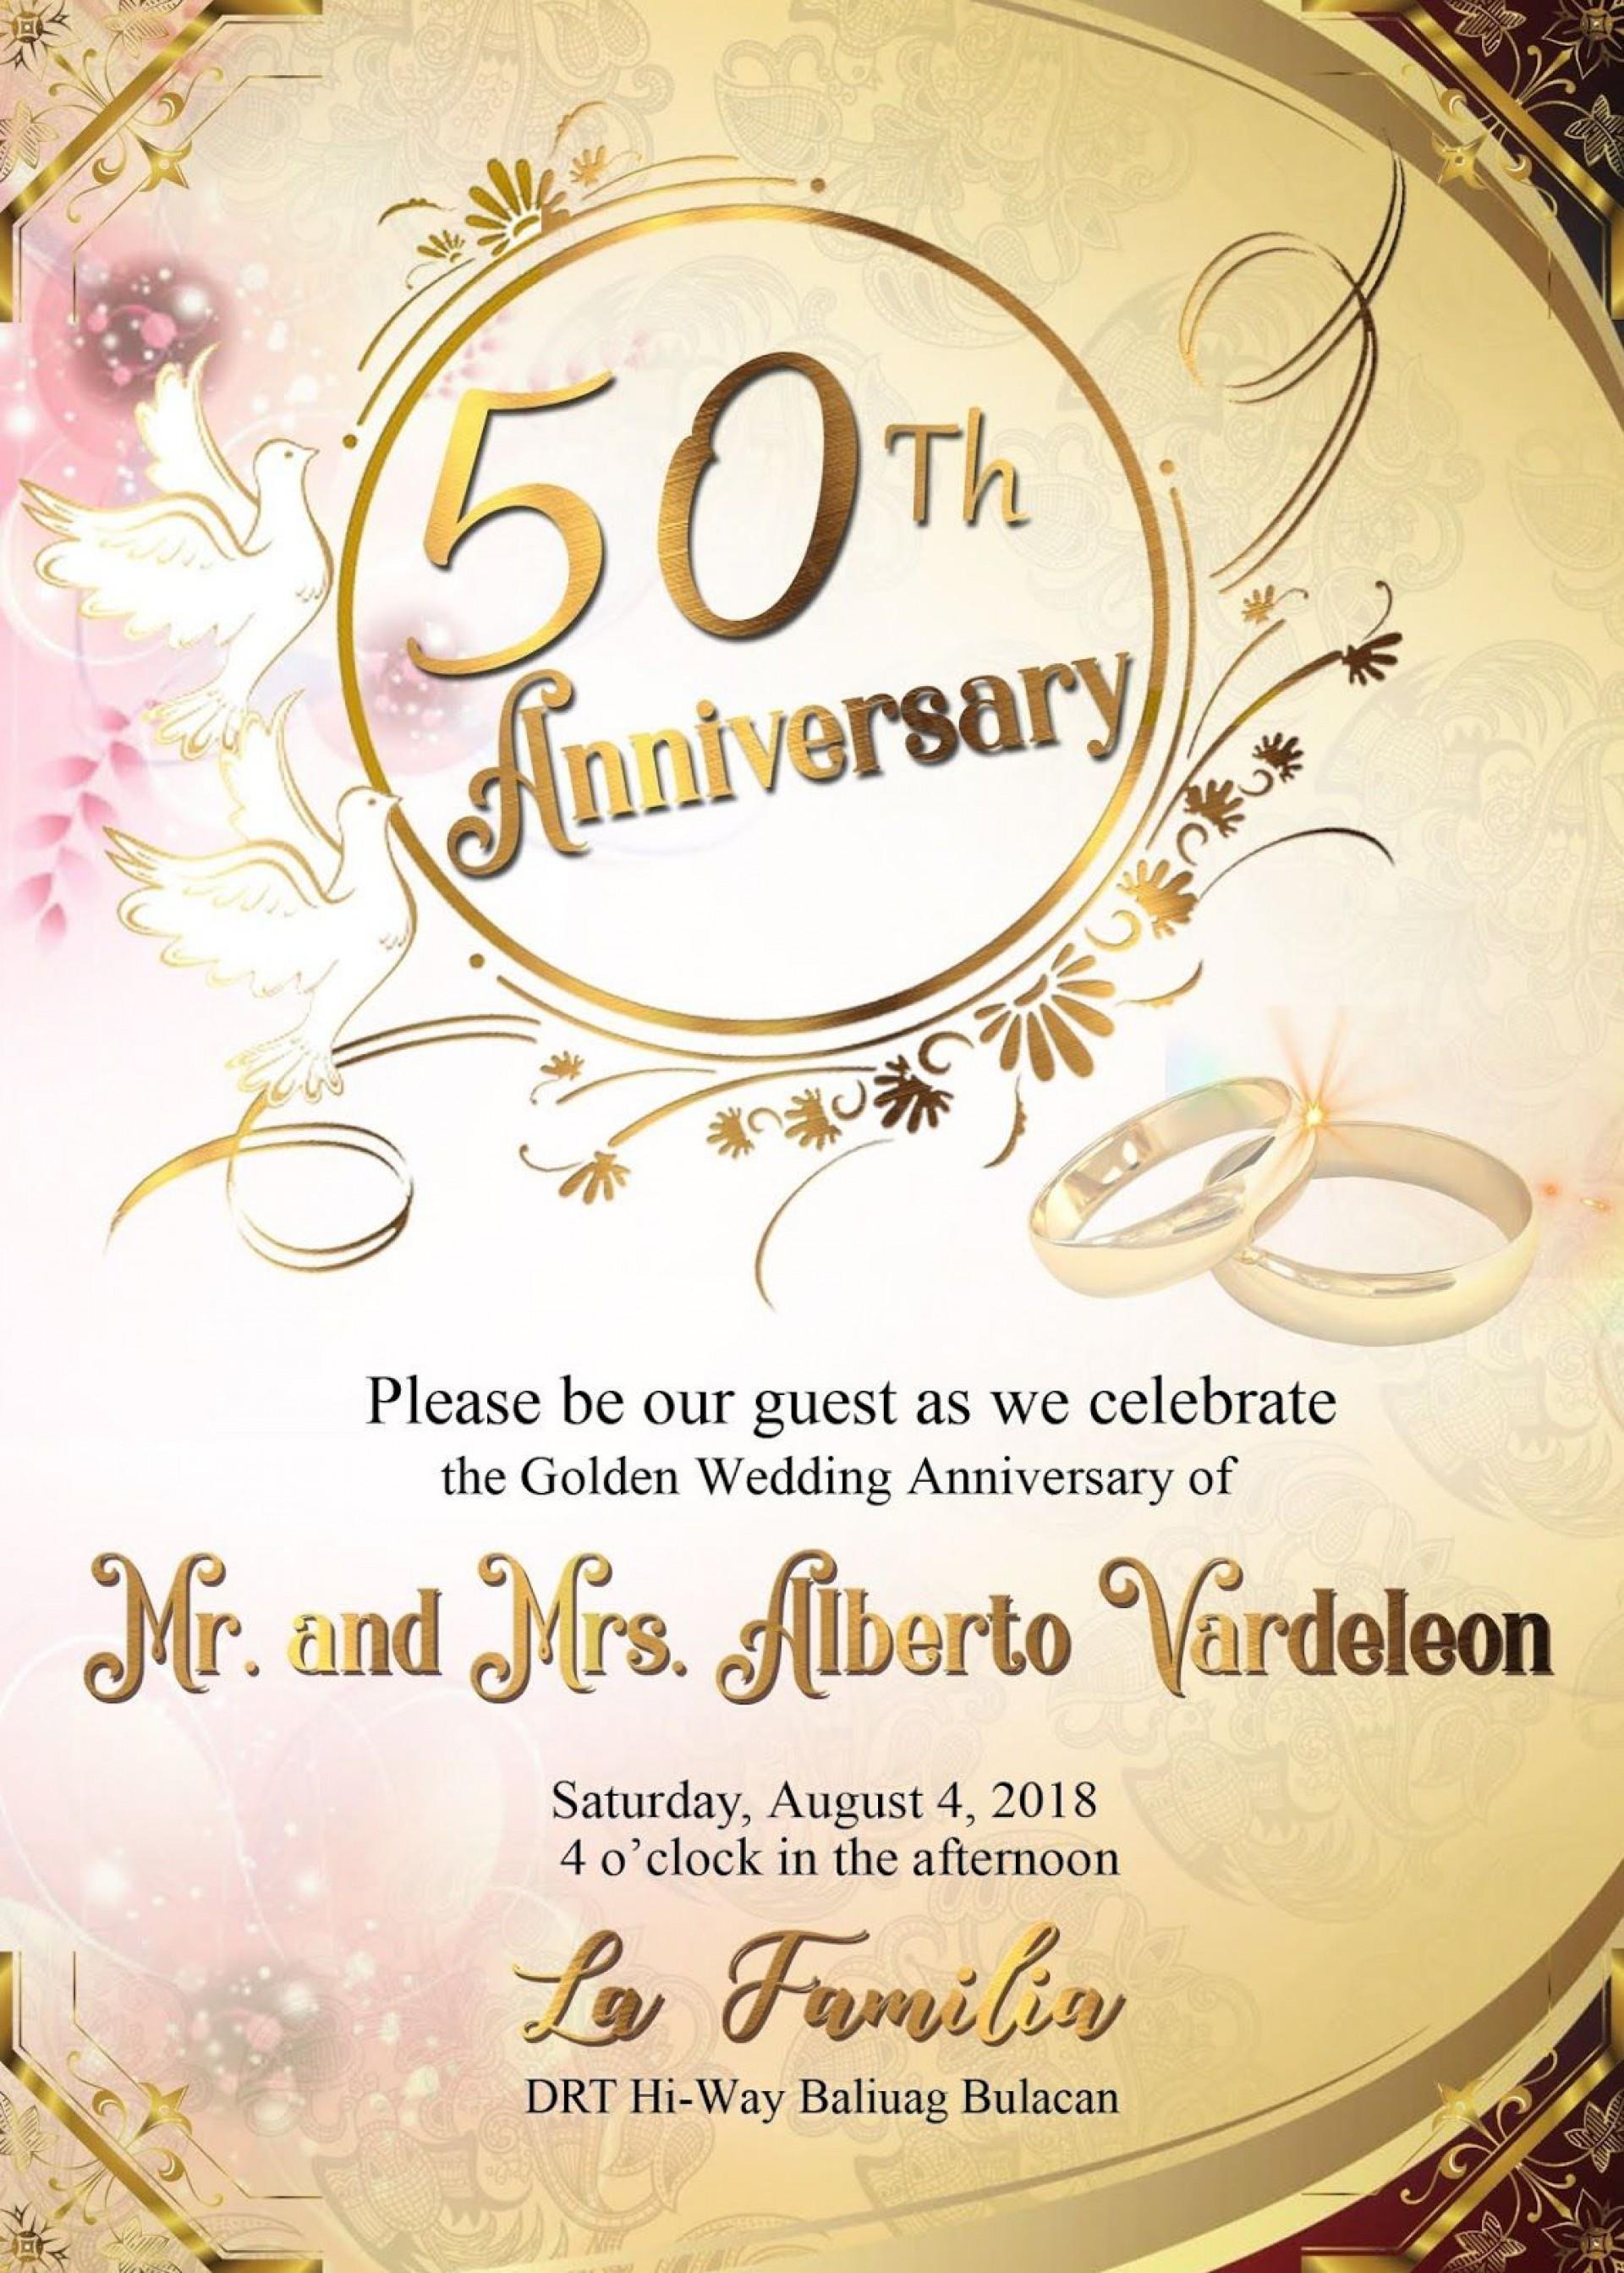 009 Formidable 50th Wedding Anniversary Invitation Card Template Sample  Templates1920